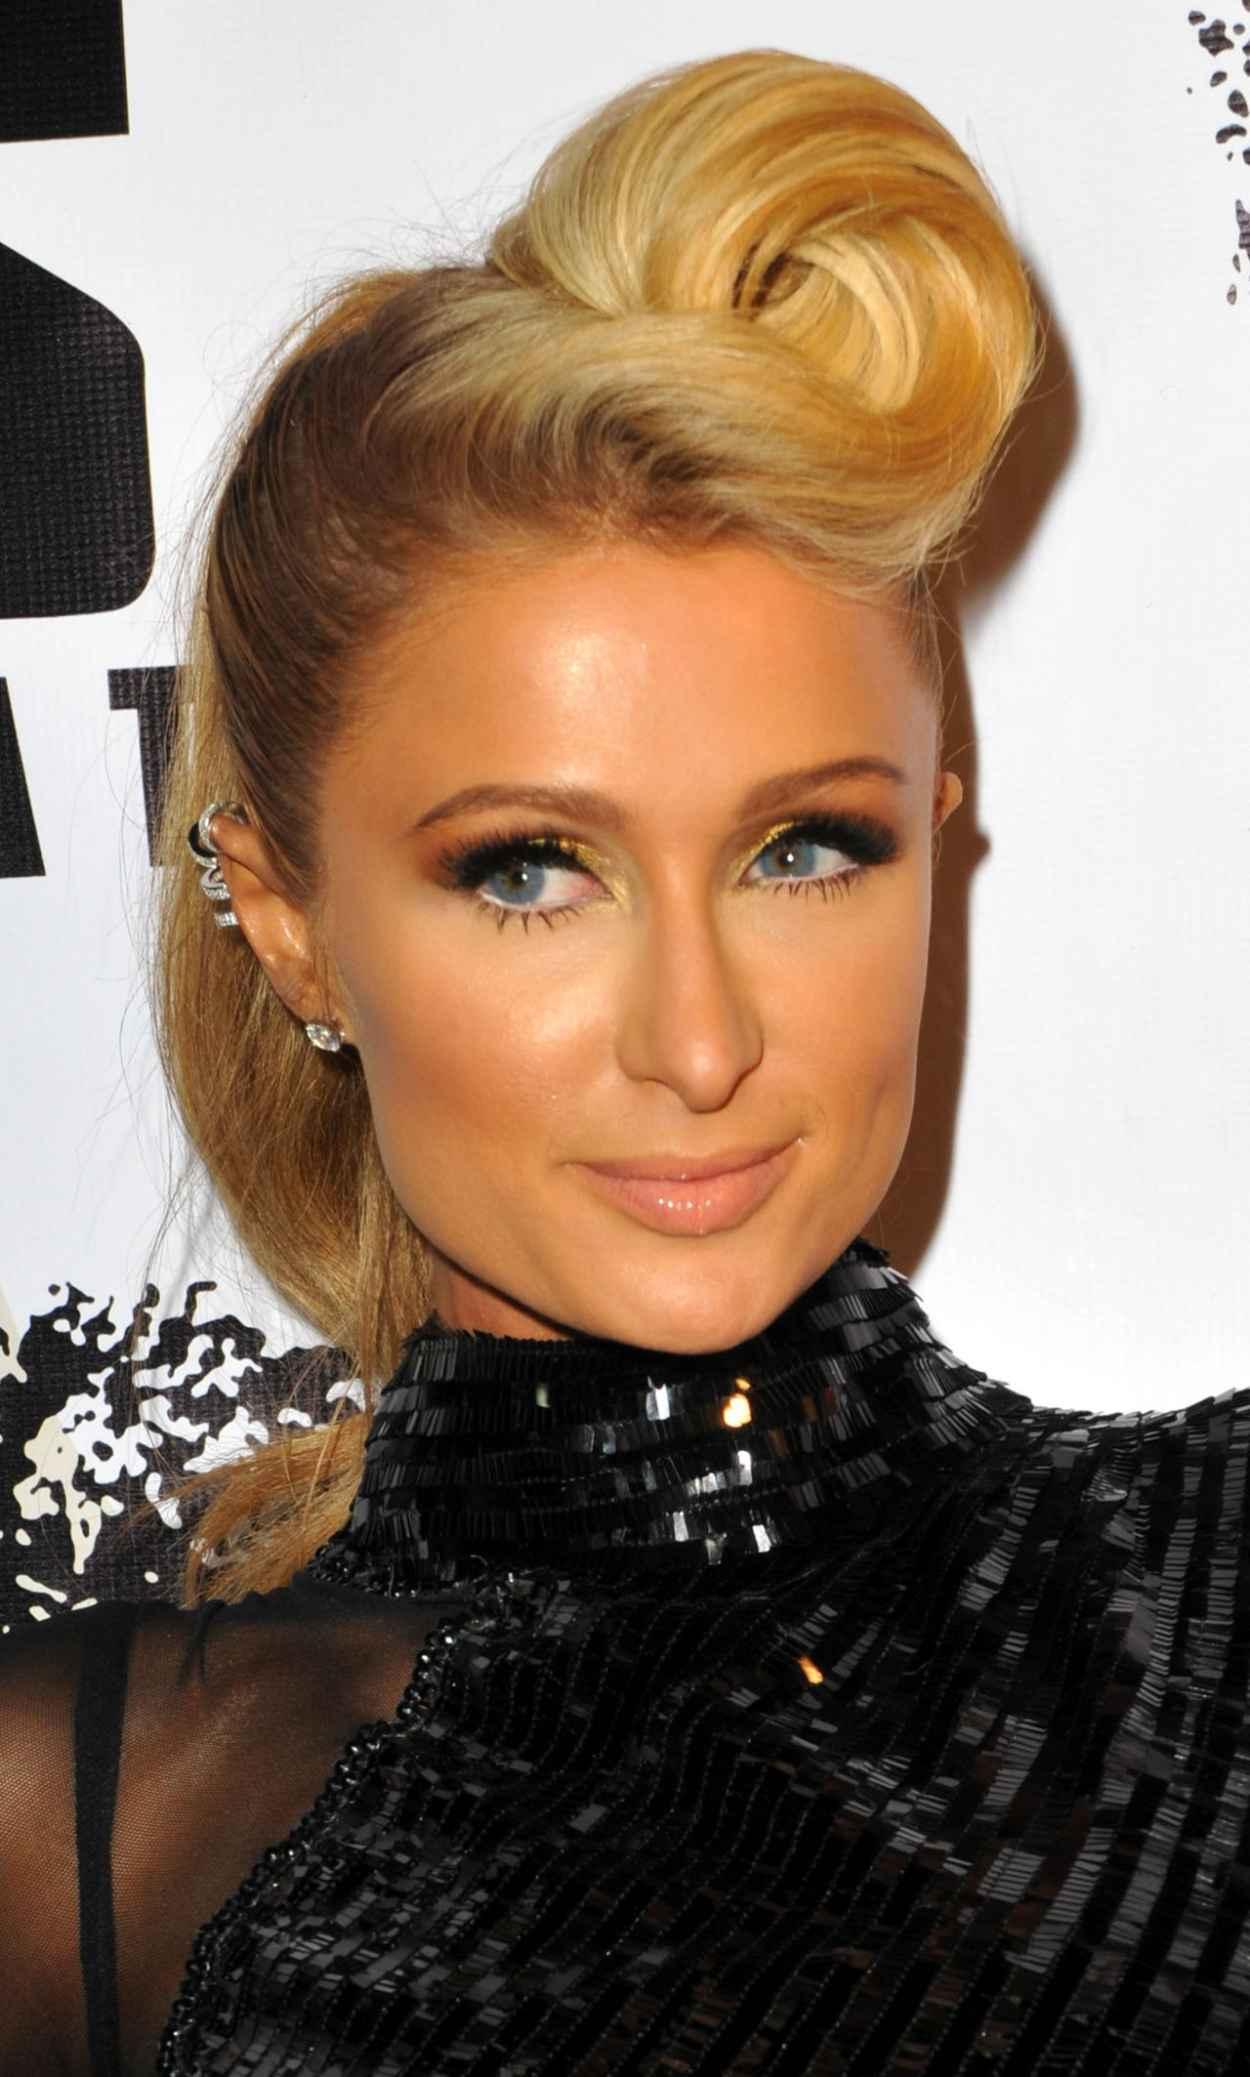 Paris Hilton Red Carpet Photos - Pre-Grammy Celebration at Boulevard3 - January 2015-1